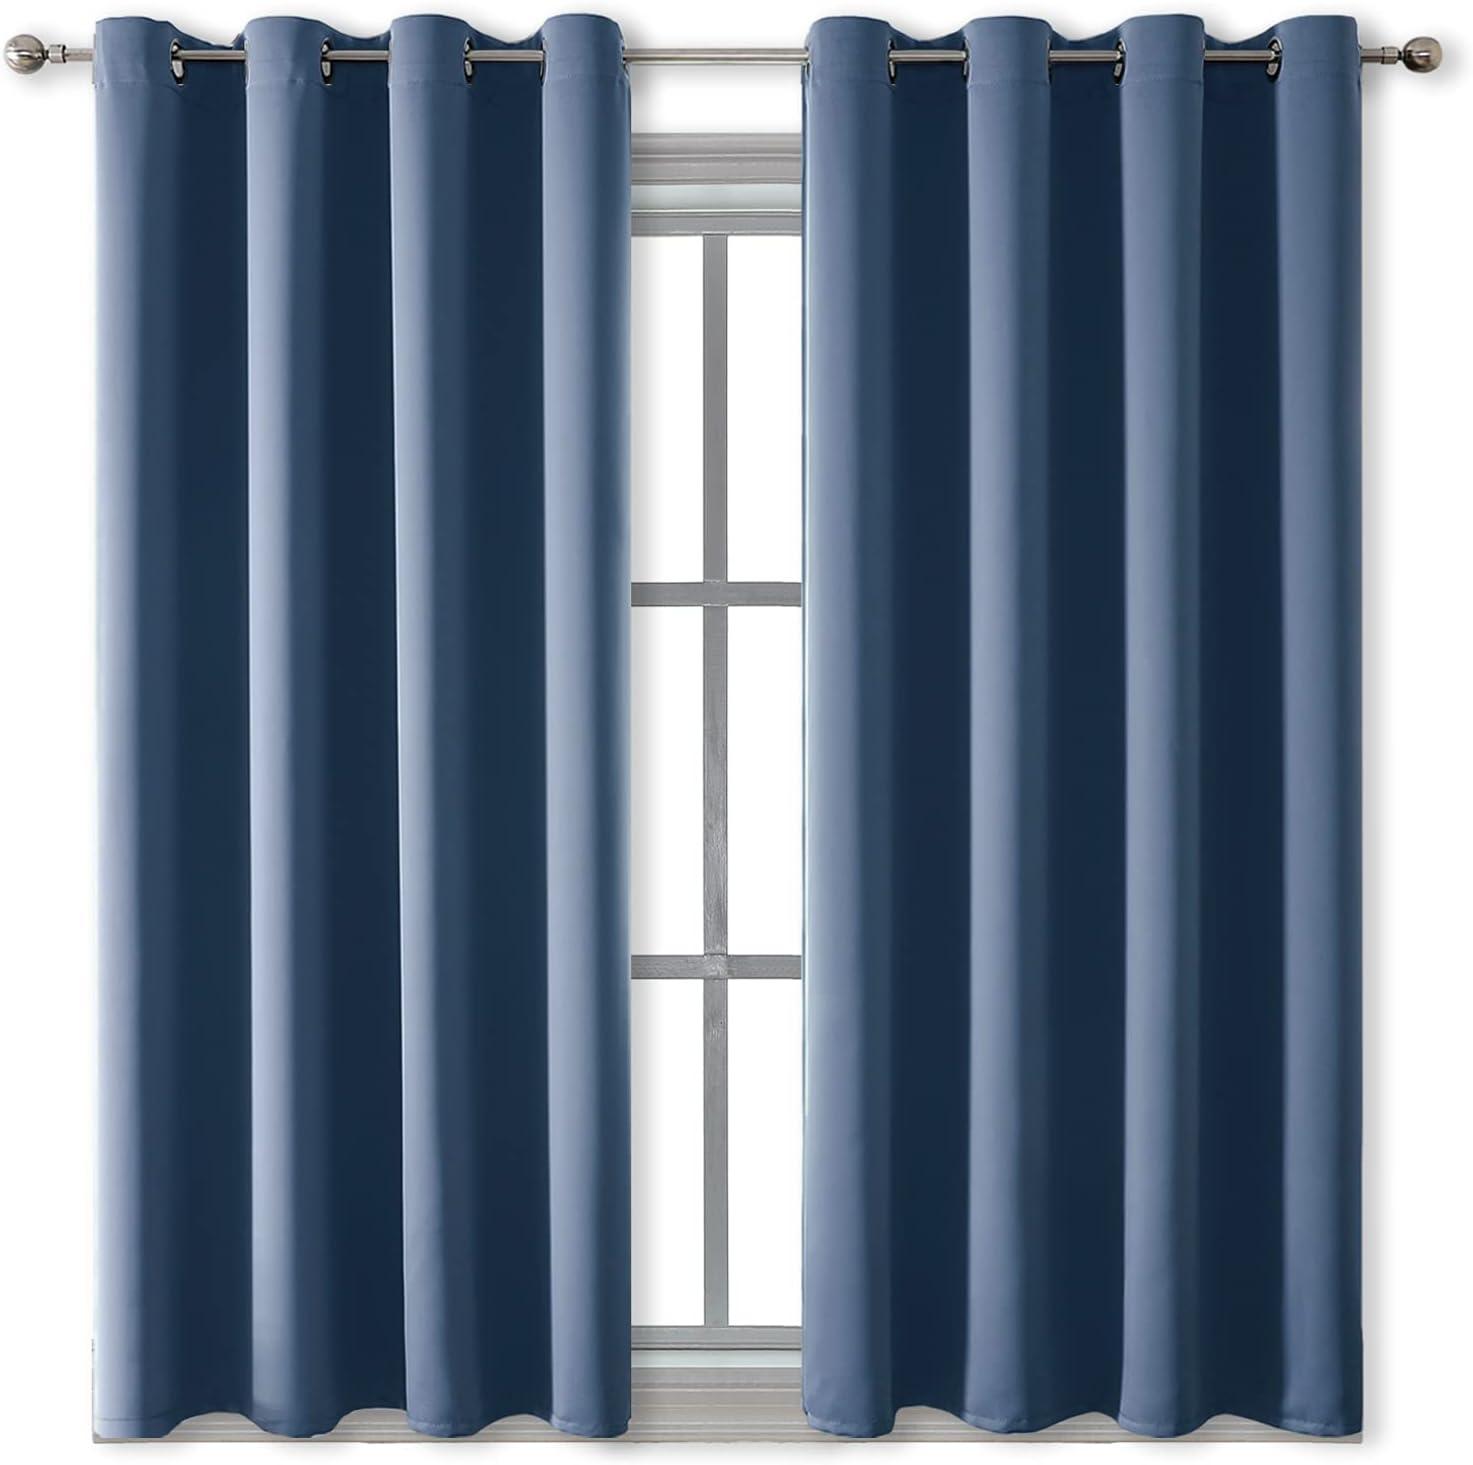 Recommendation Rutterllow Blackout Curtains for Window Branded goods Bedroom Room Darkening